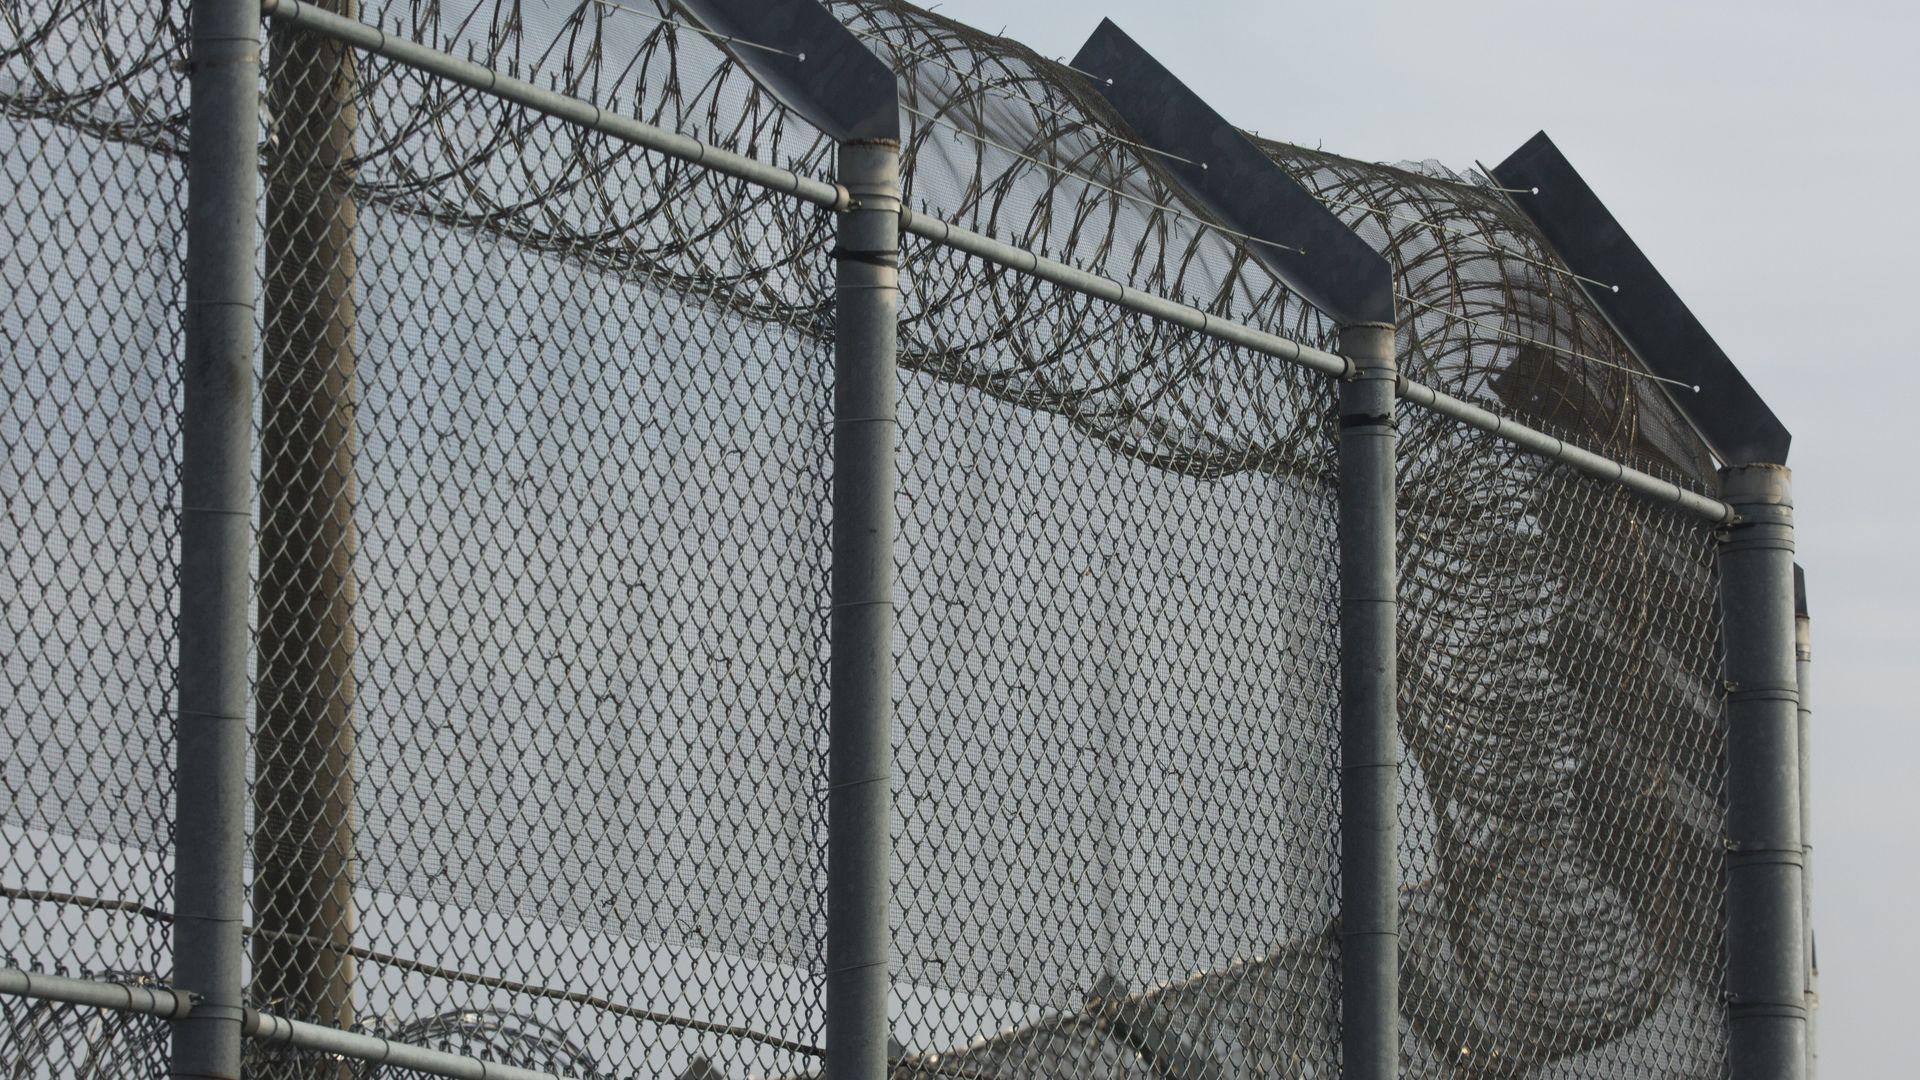 Jailhouse fence